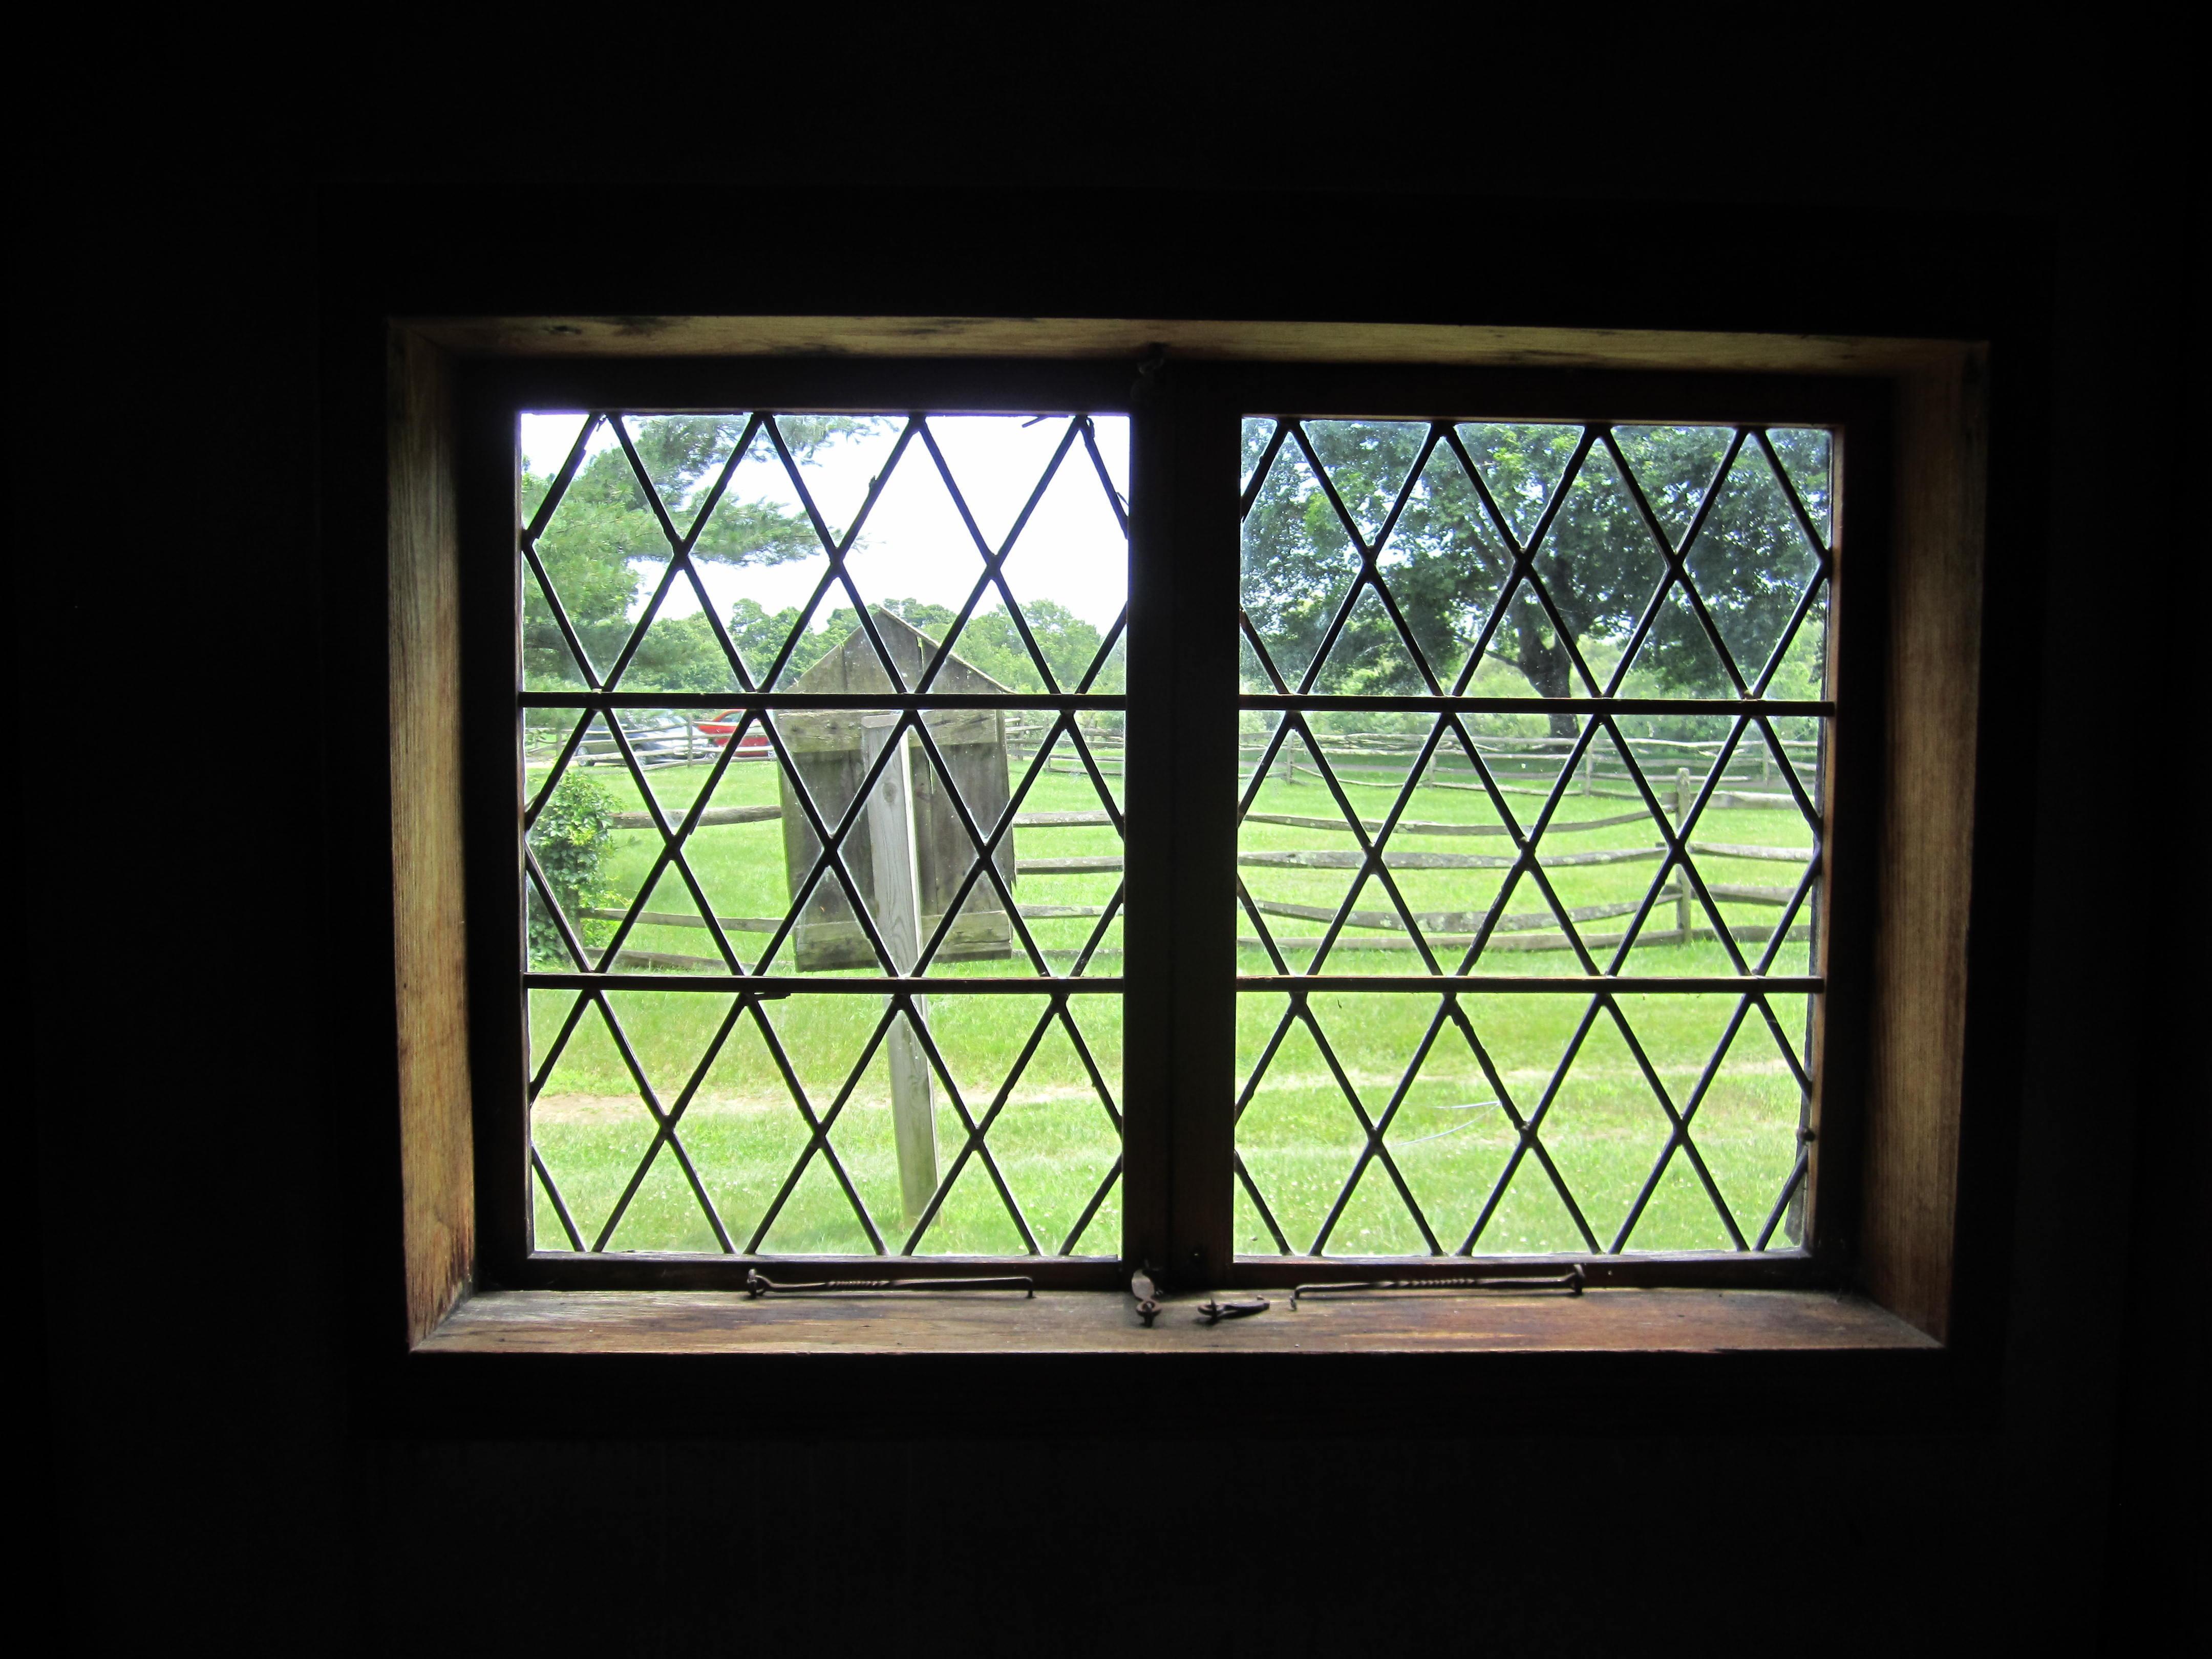 Window Panes Window With Diamond Panes